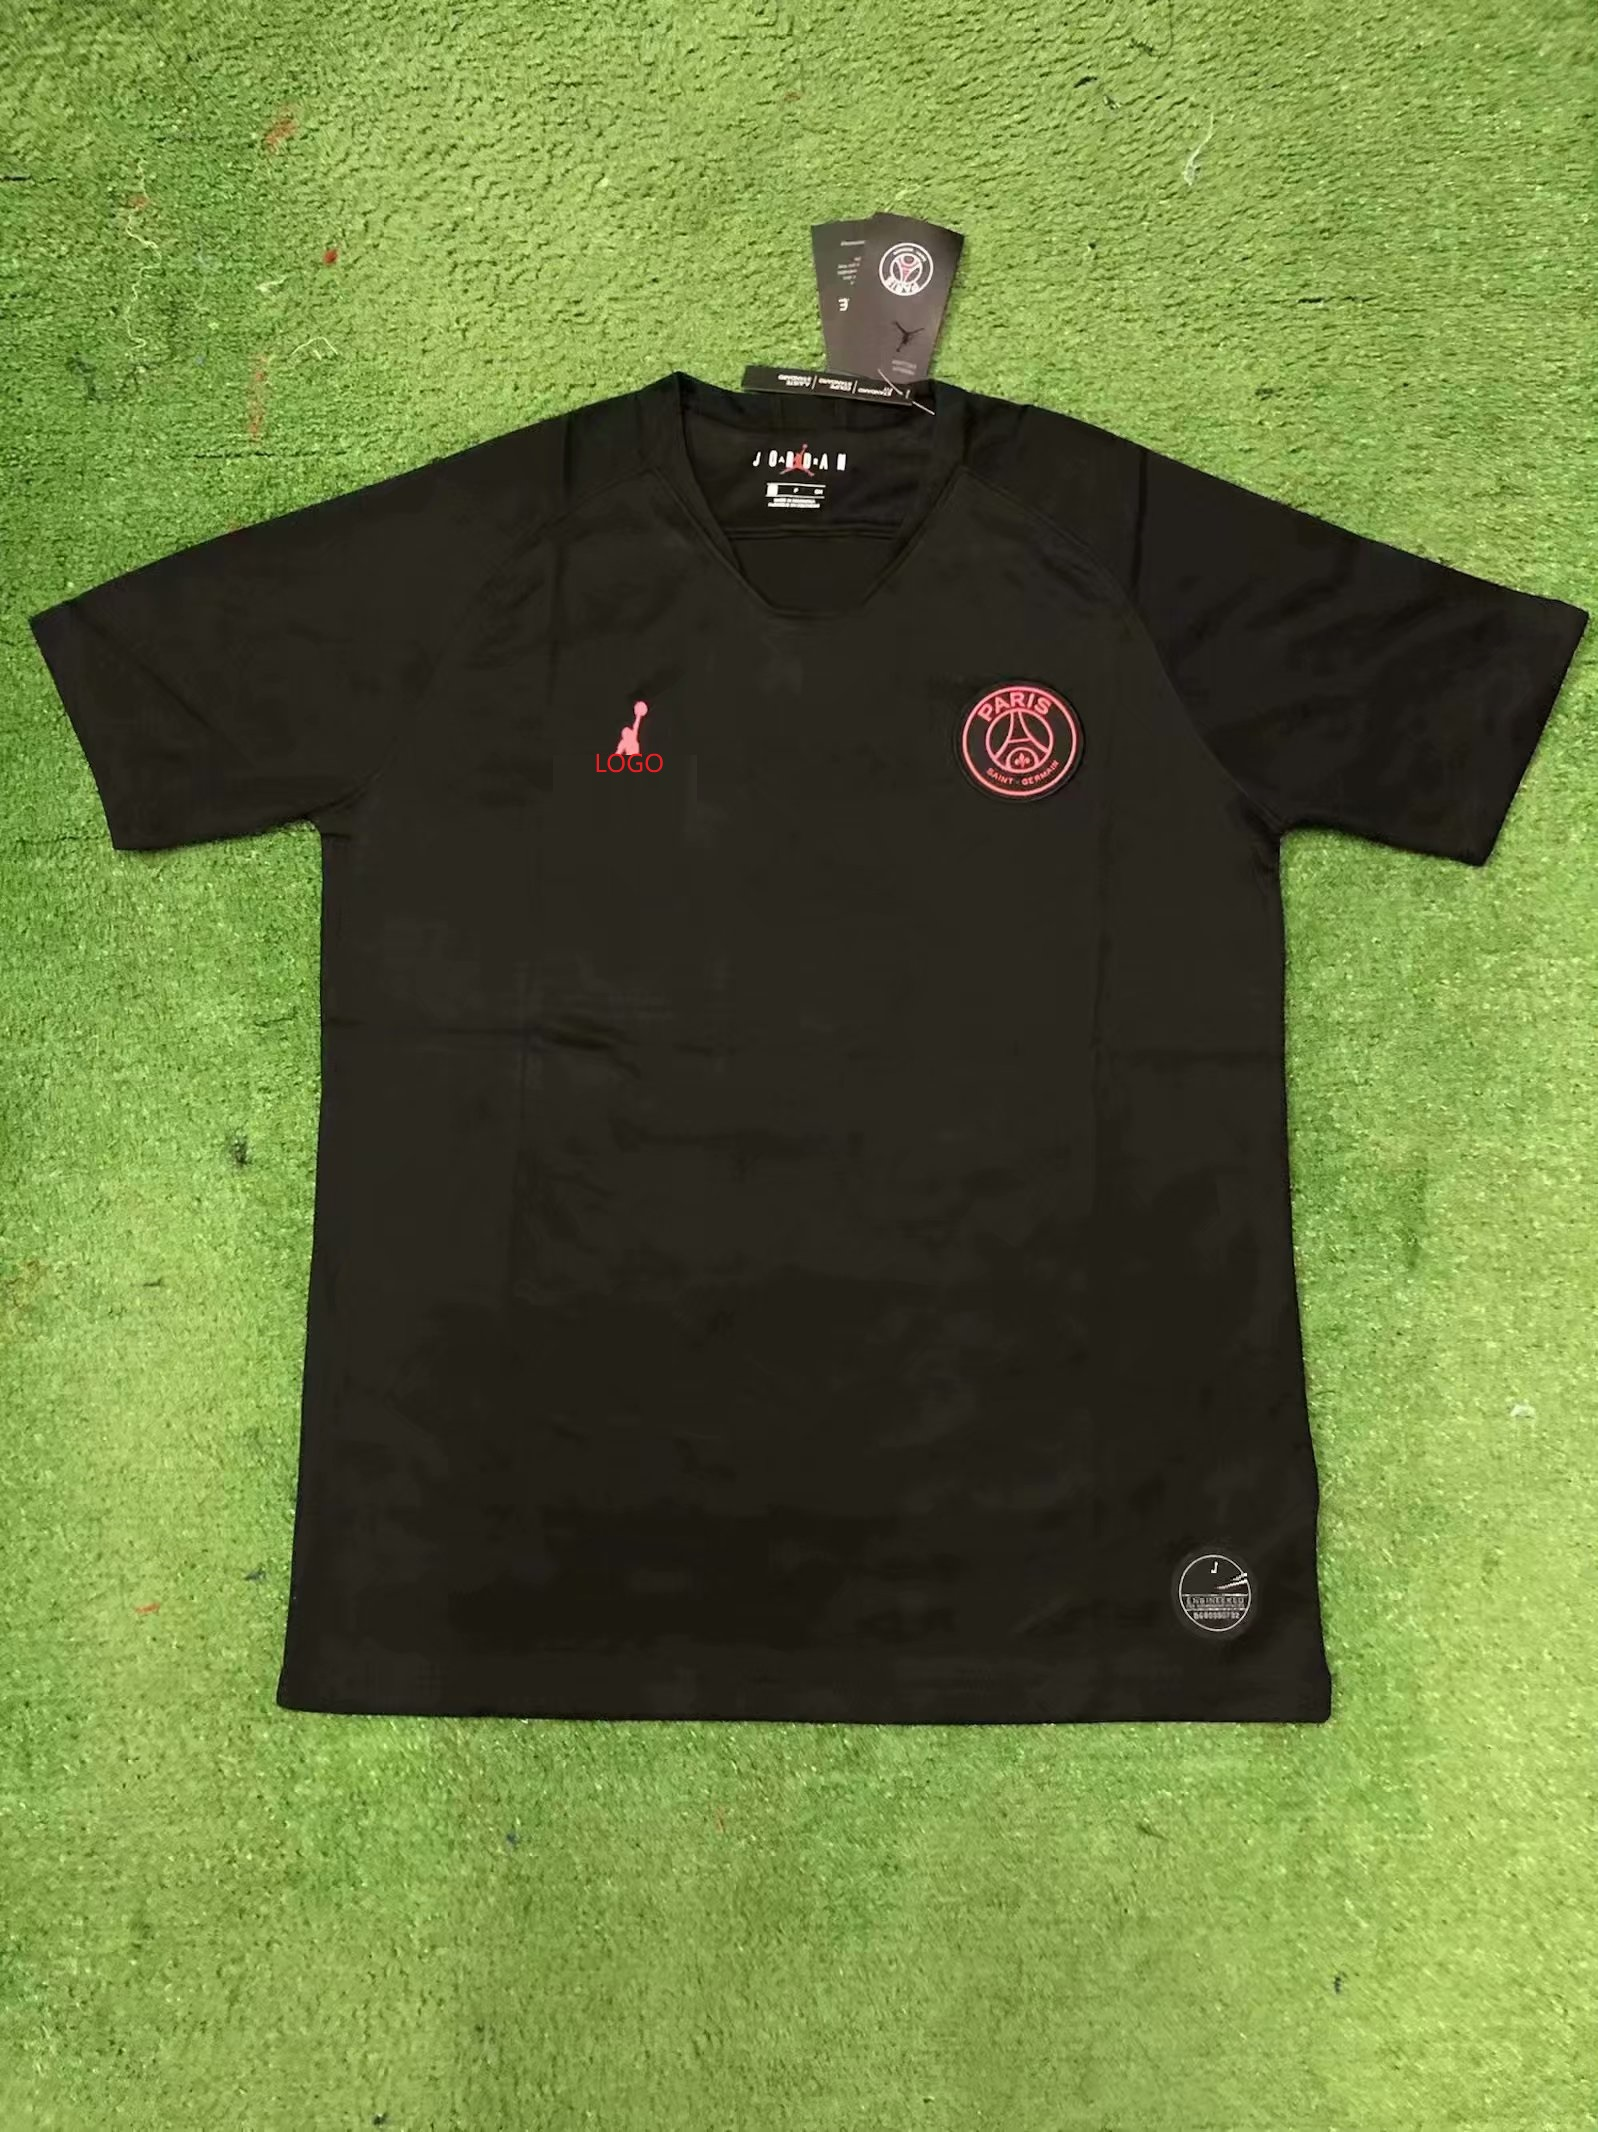 buy popular fcda2 4154e 19/20 men thai version PSG Jordan pre-match balck soccer/football  jersey/shirt